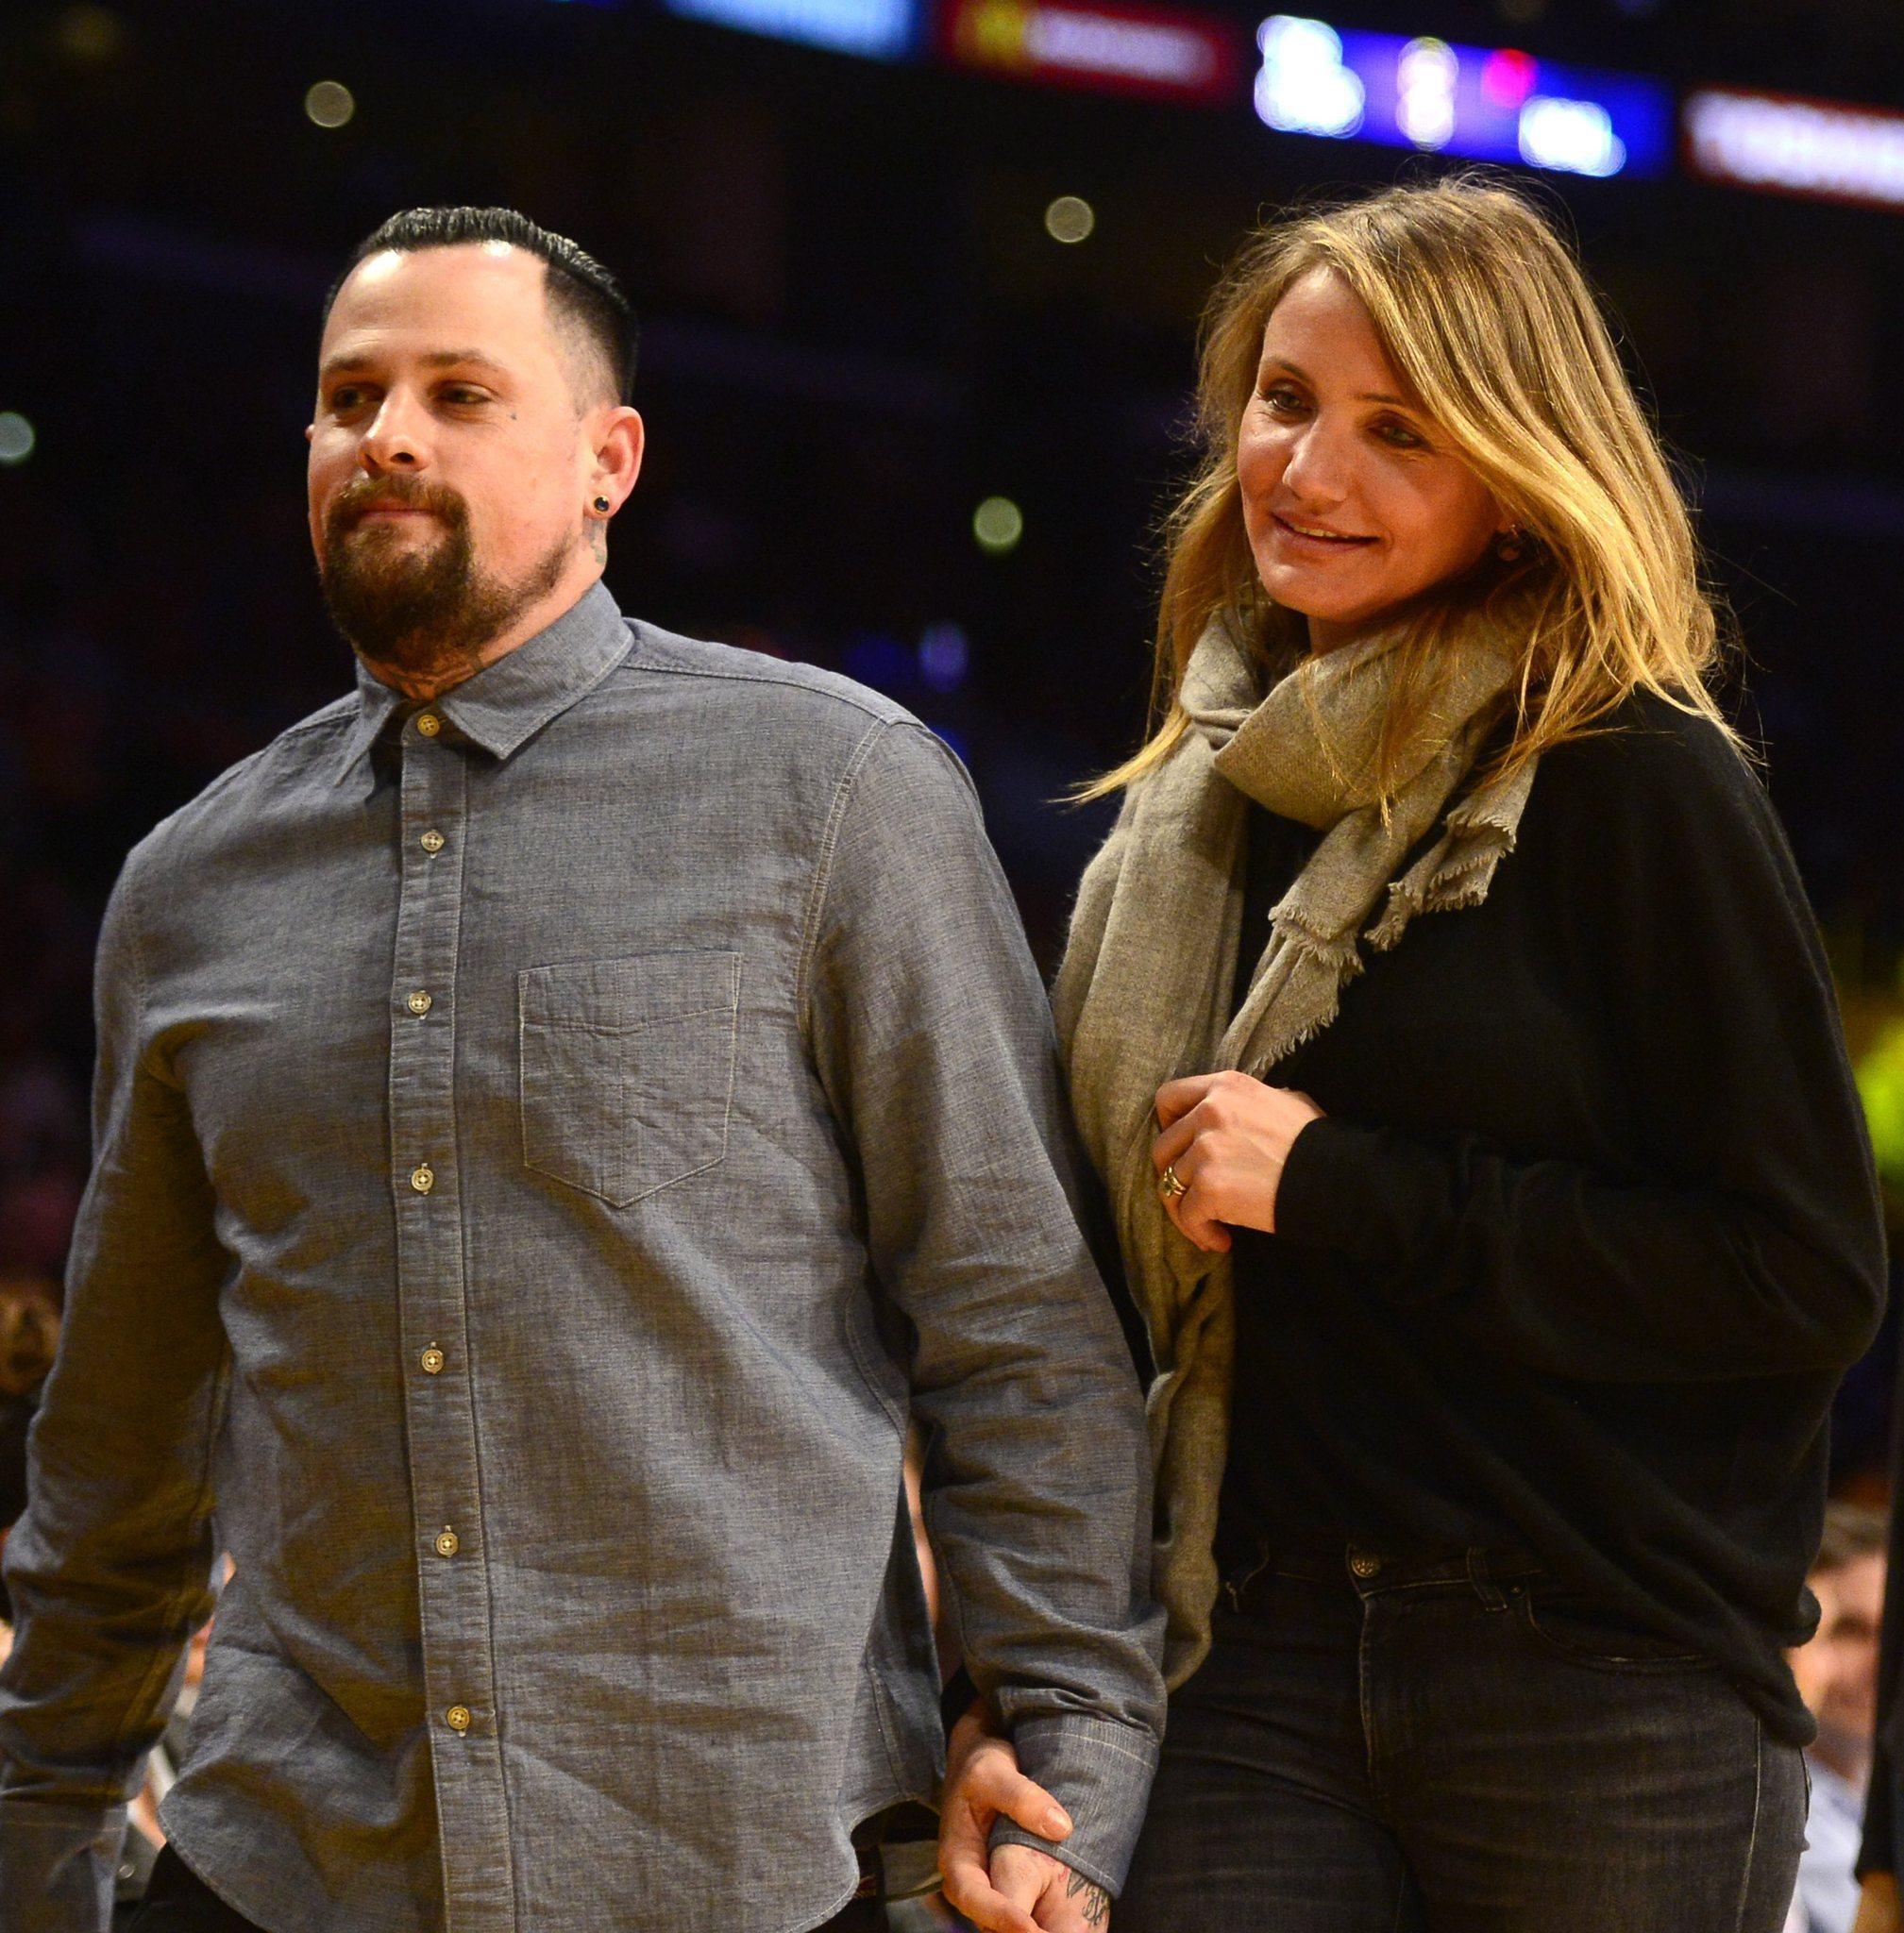 Cameron Diaz gushes over husband Benji Madden on Instagram ...Cameron Diaz Husband Dies